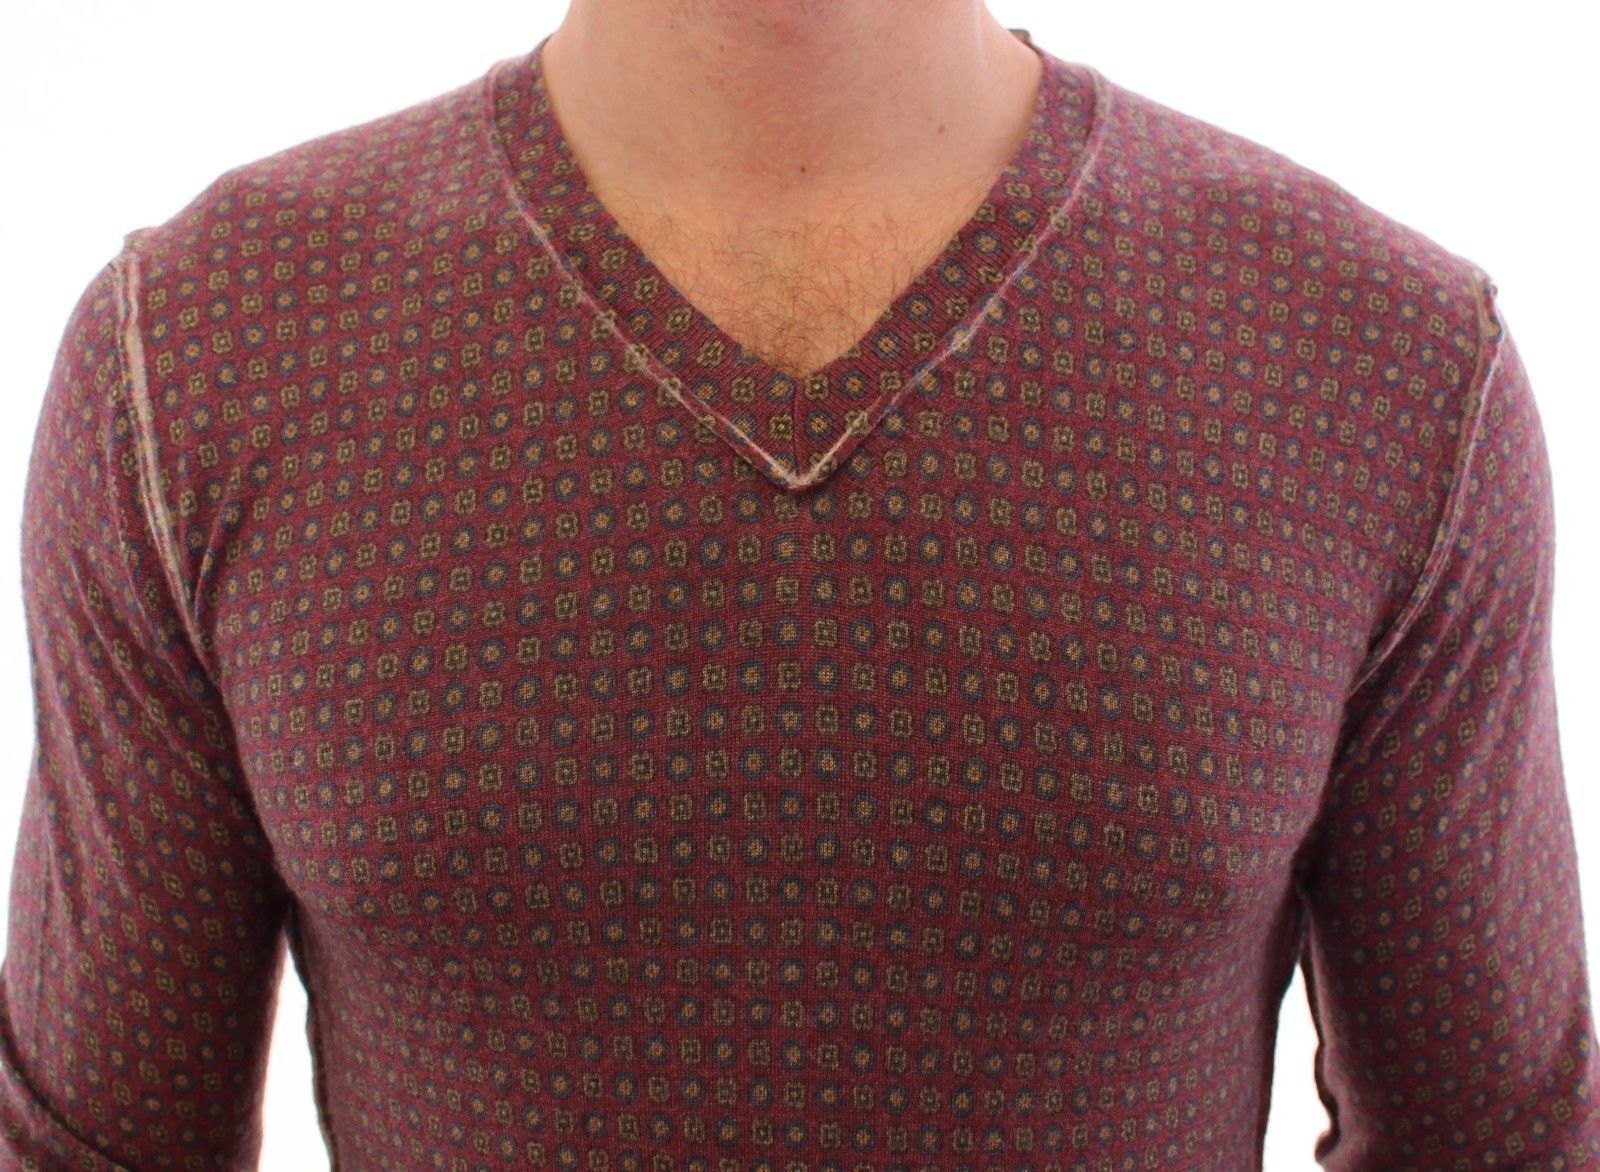 Dolce & Gabbana Multicolor Cashmere Sweater Pullover Top